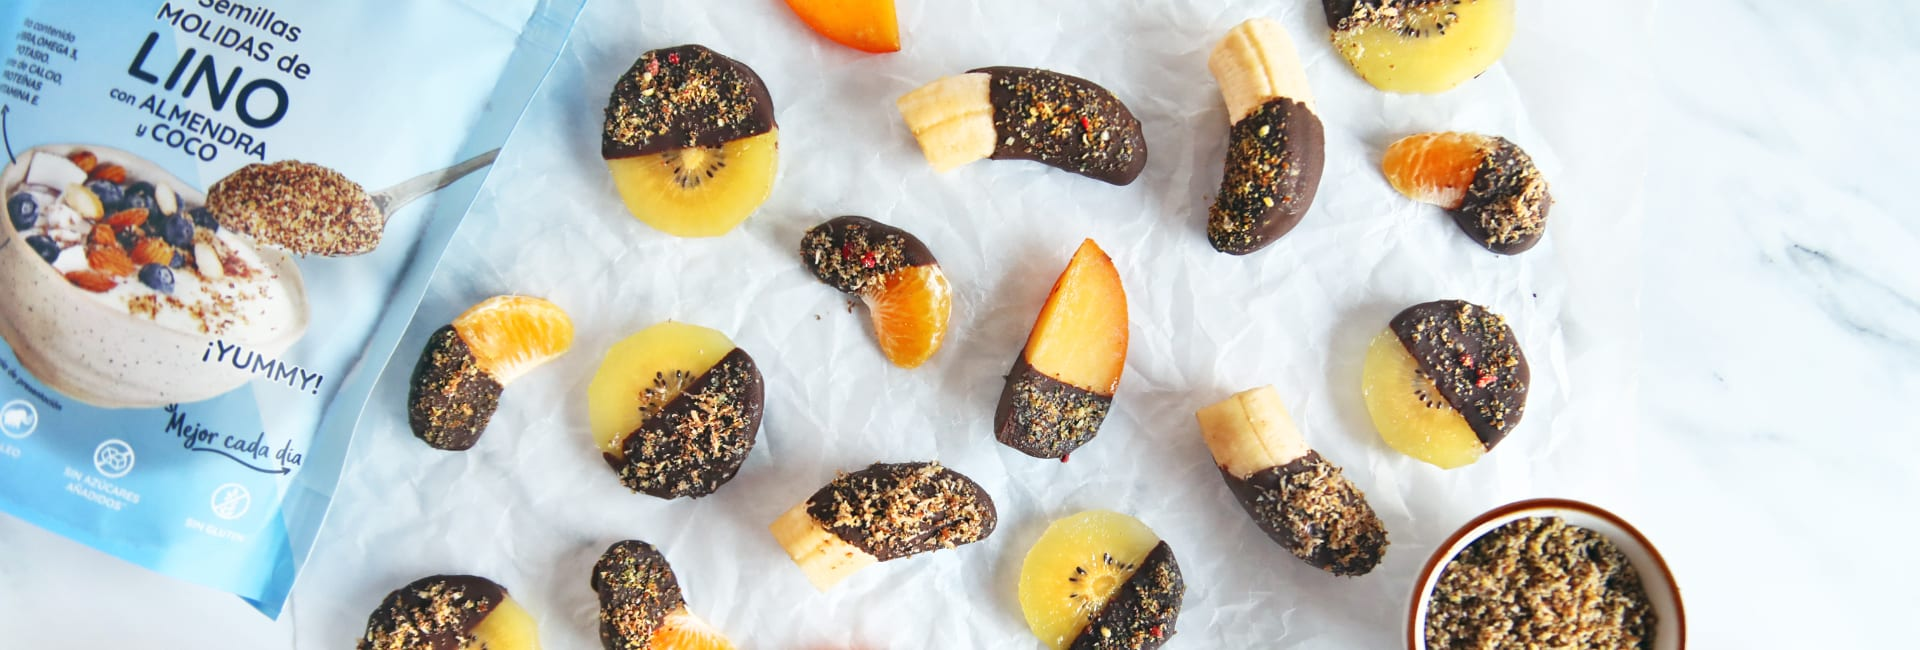 fruta bañada en chocolate